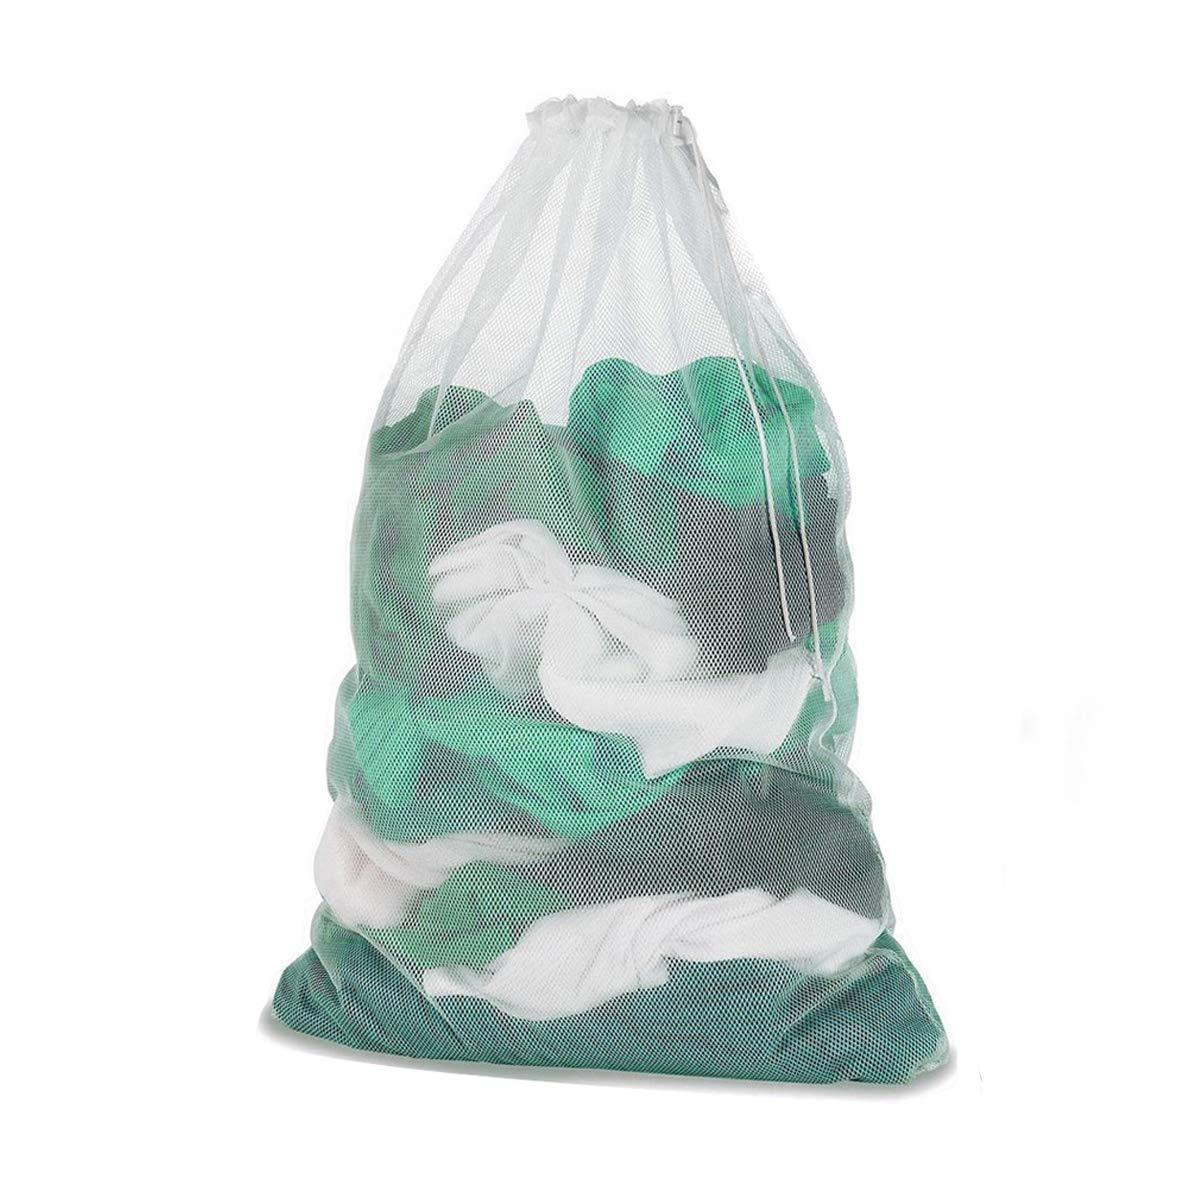 Laundry Bag ,Mesh Washing Clothes Bags - For Washing Machines - 60x90 cm(23.62